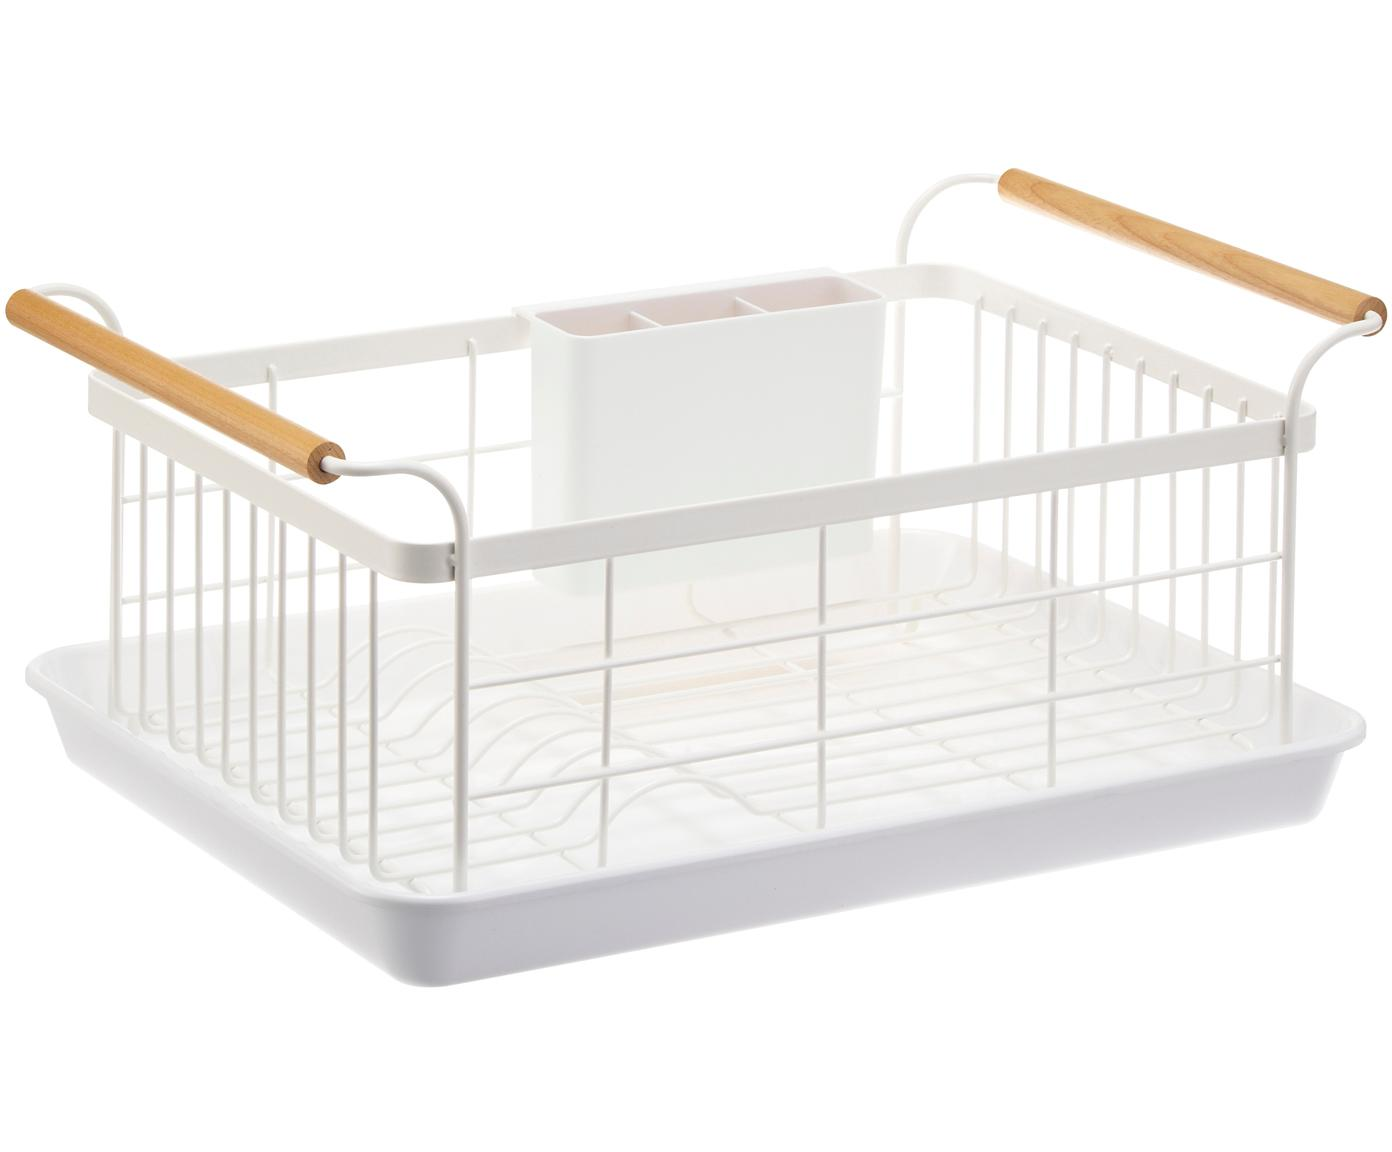 Escurreplatos Tosca, Cesta: acero, recubierto, Asas: madera, Blanco, madera, An 47 x Al 20 cm